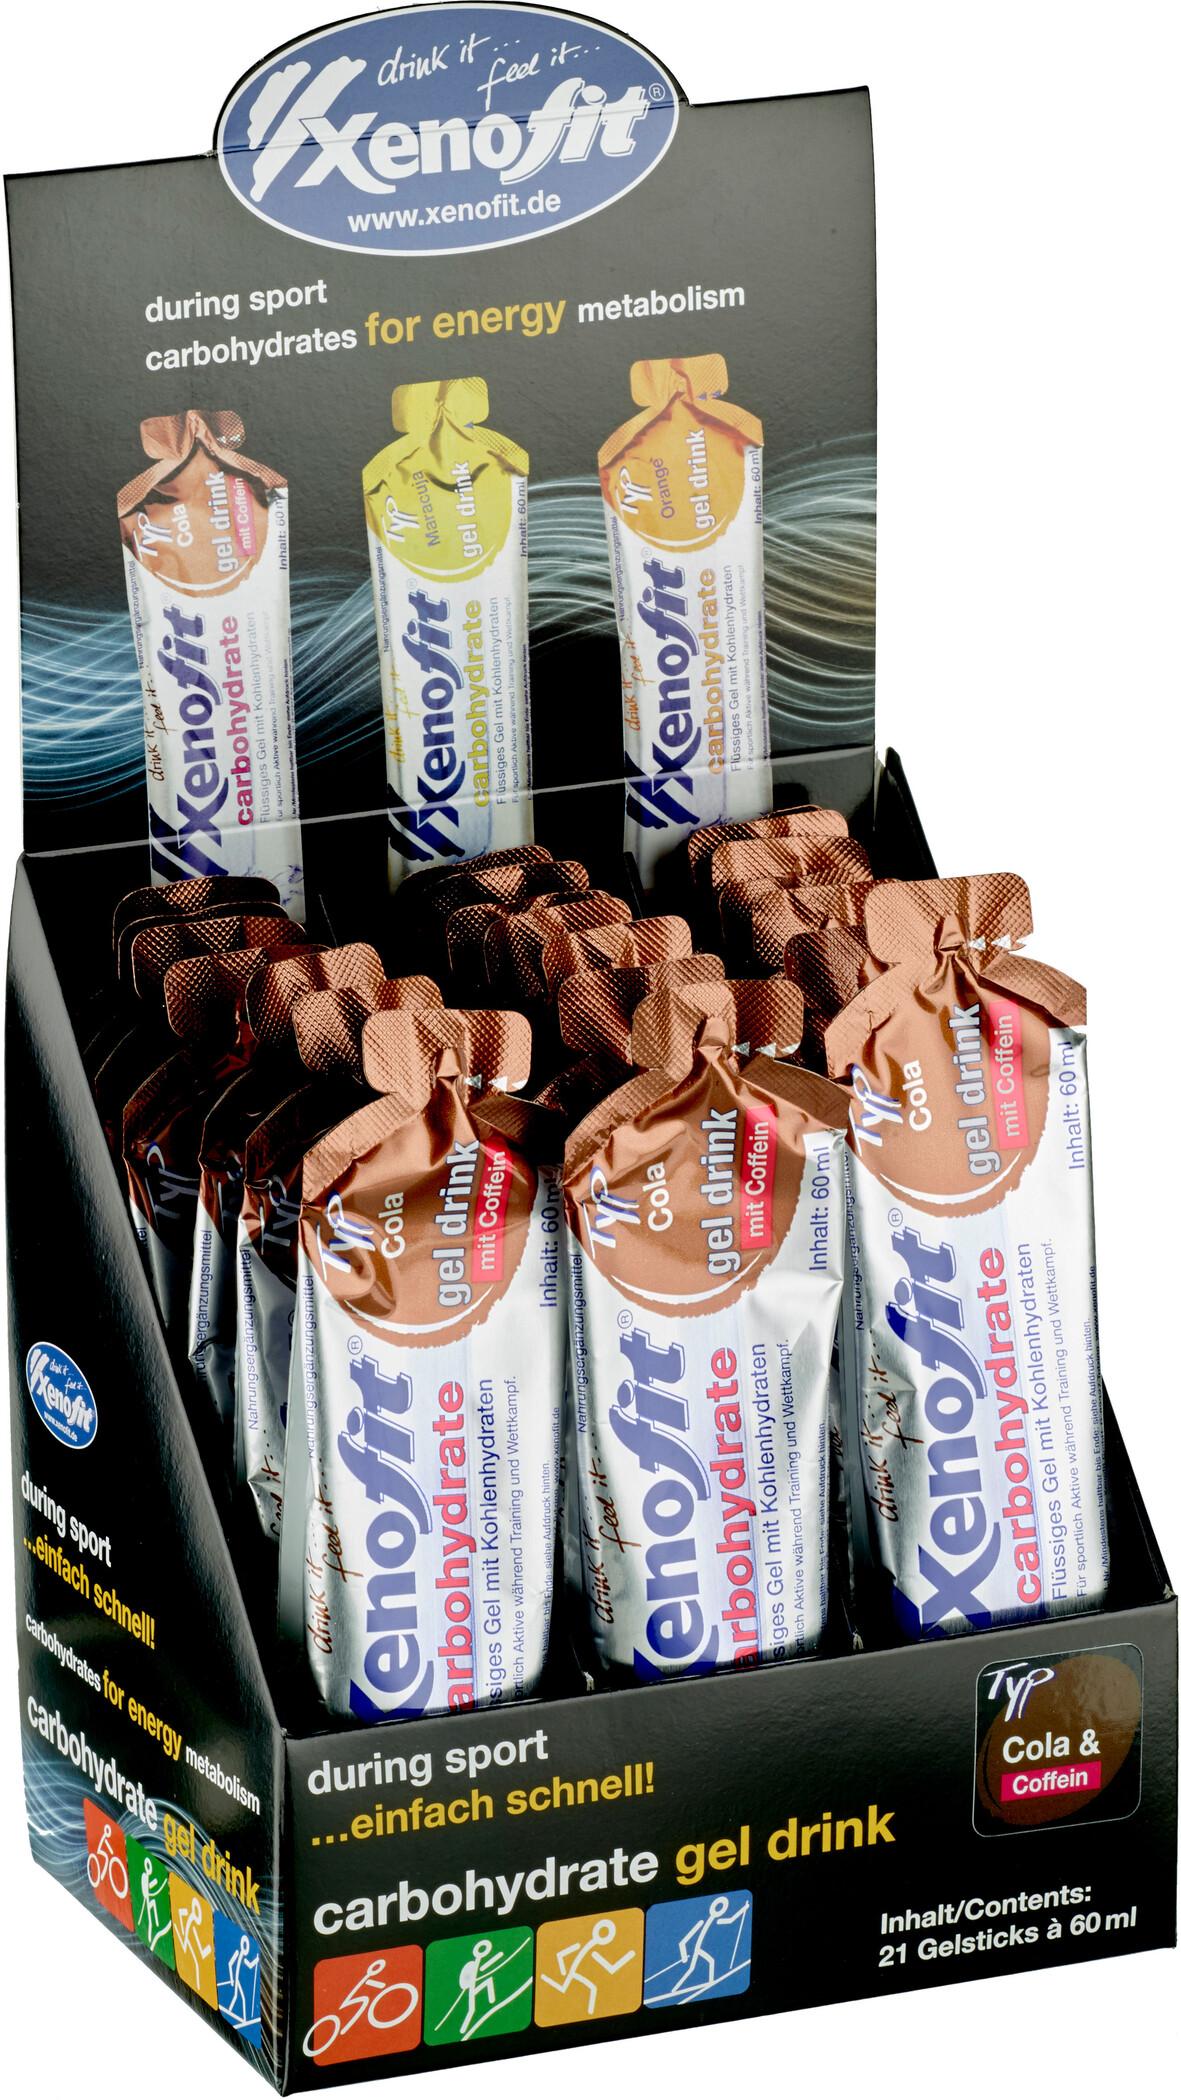 Xenofit Carbohydrate Hydro Gel Box 21x60ml, Cola with Caffein | Energigels